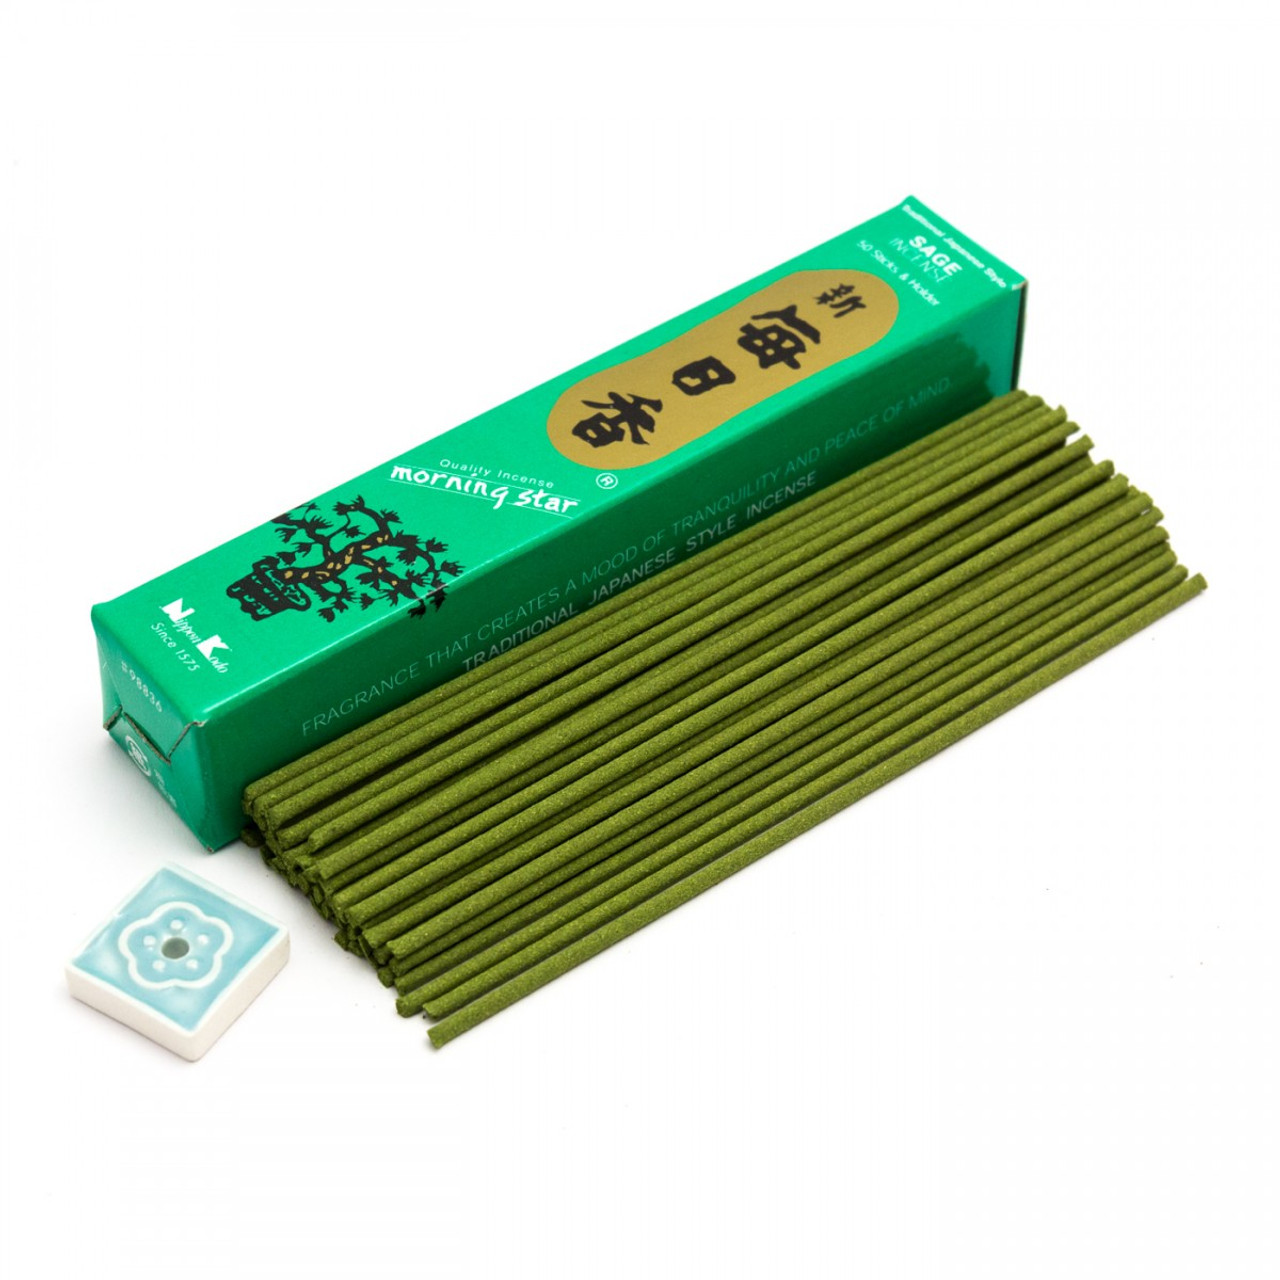 Morning Star Incense - Sage (50 Short Sticks)